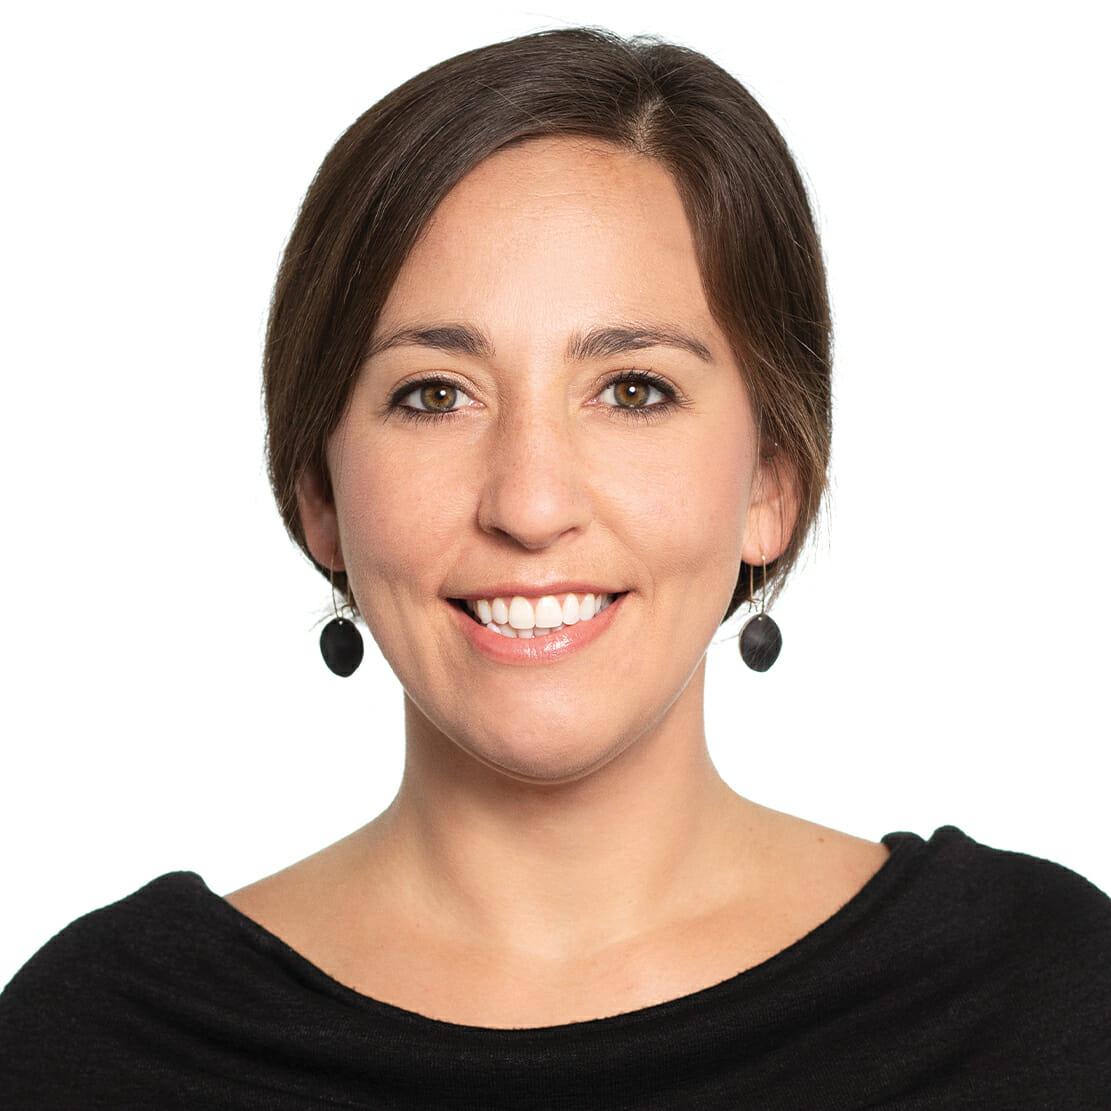 Kristen O'Gorman